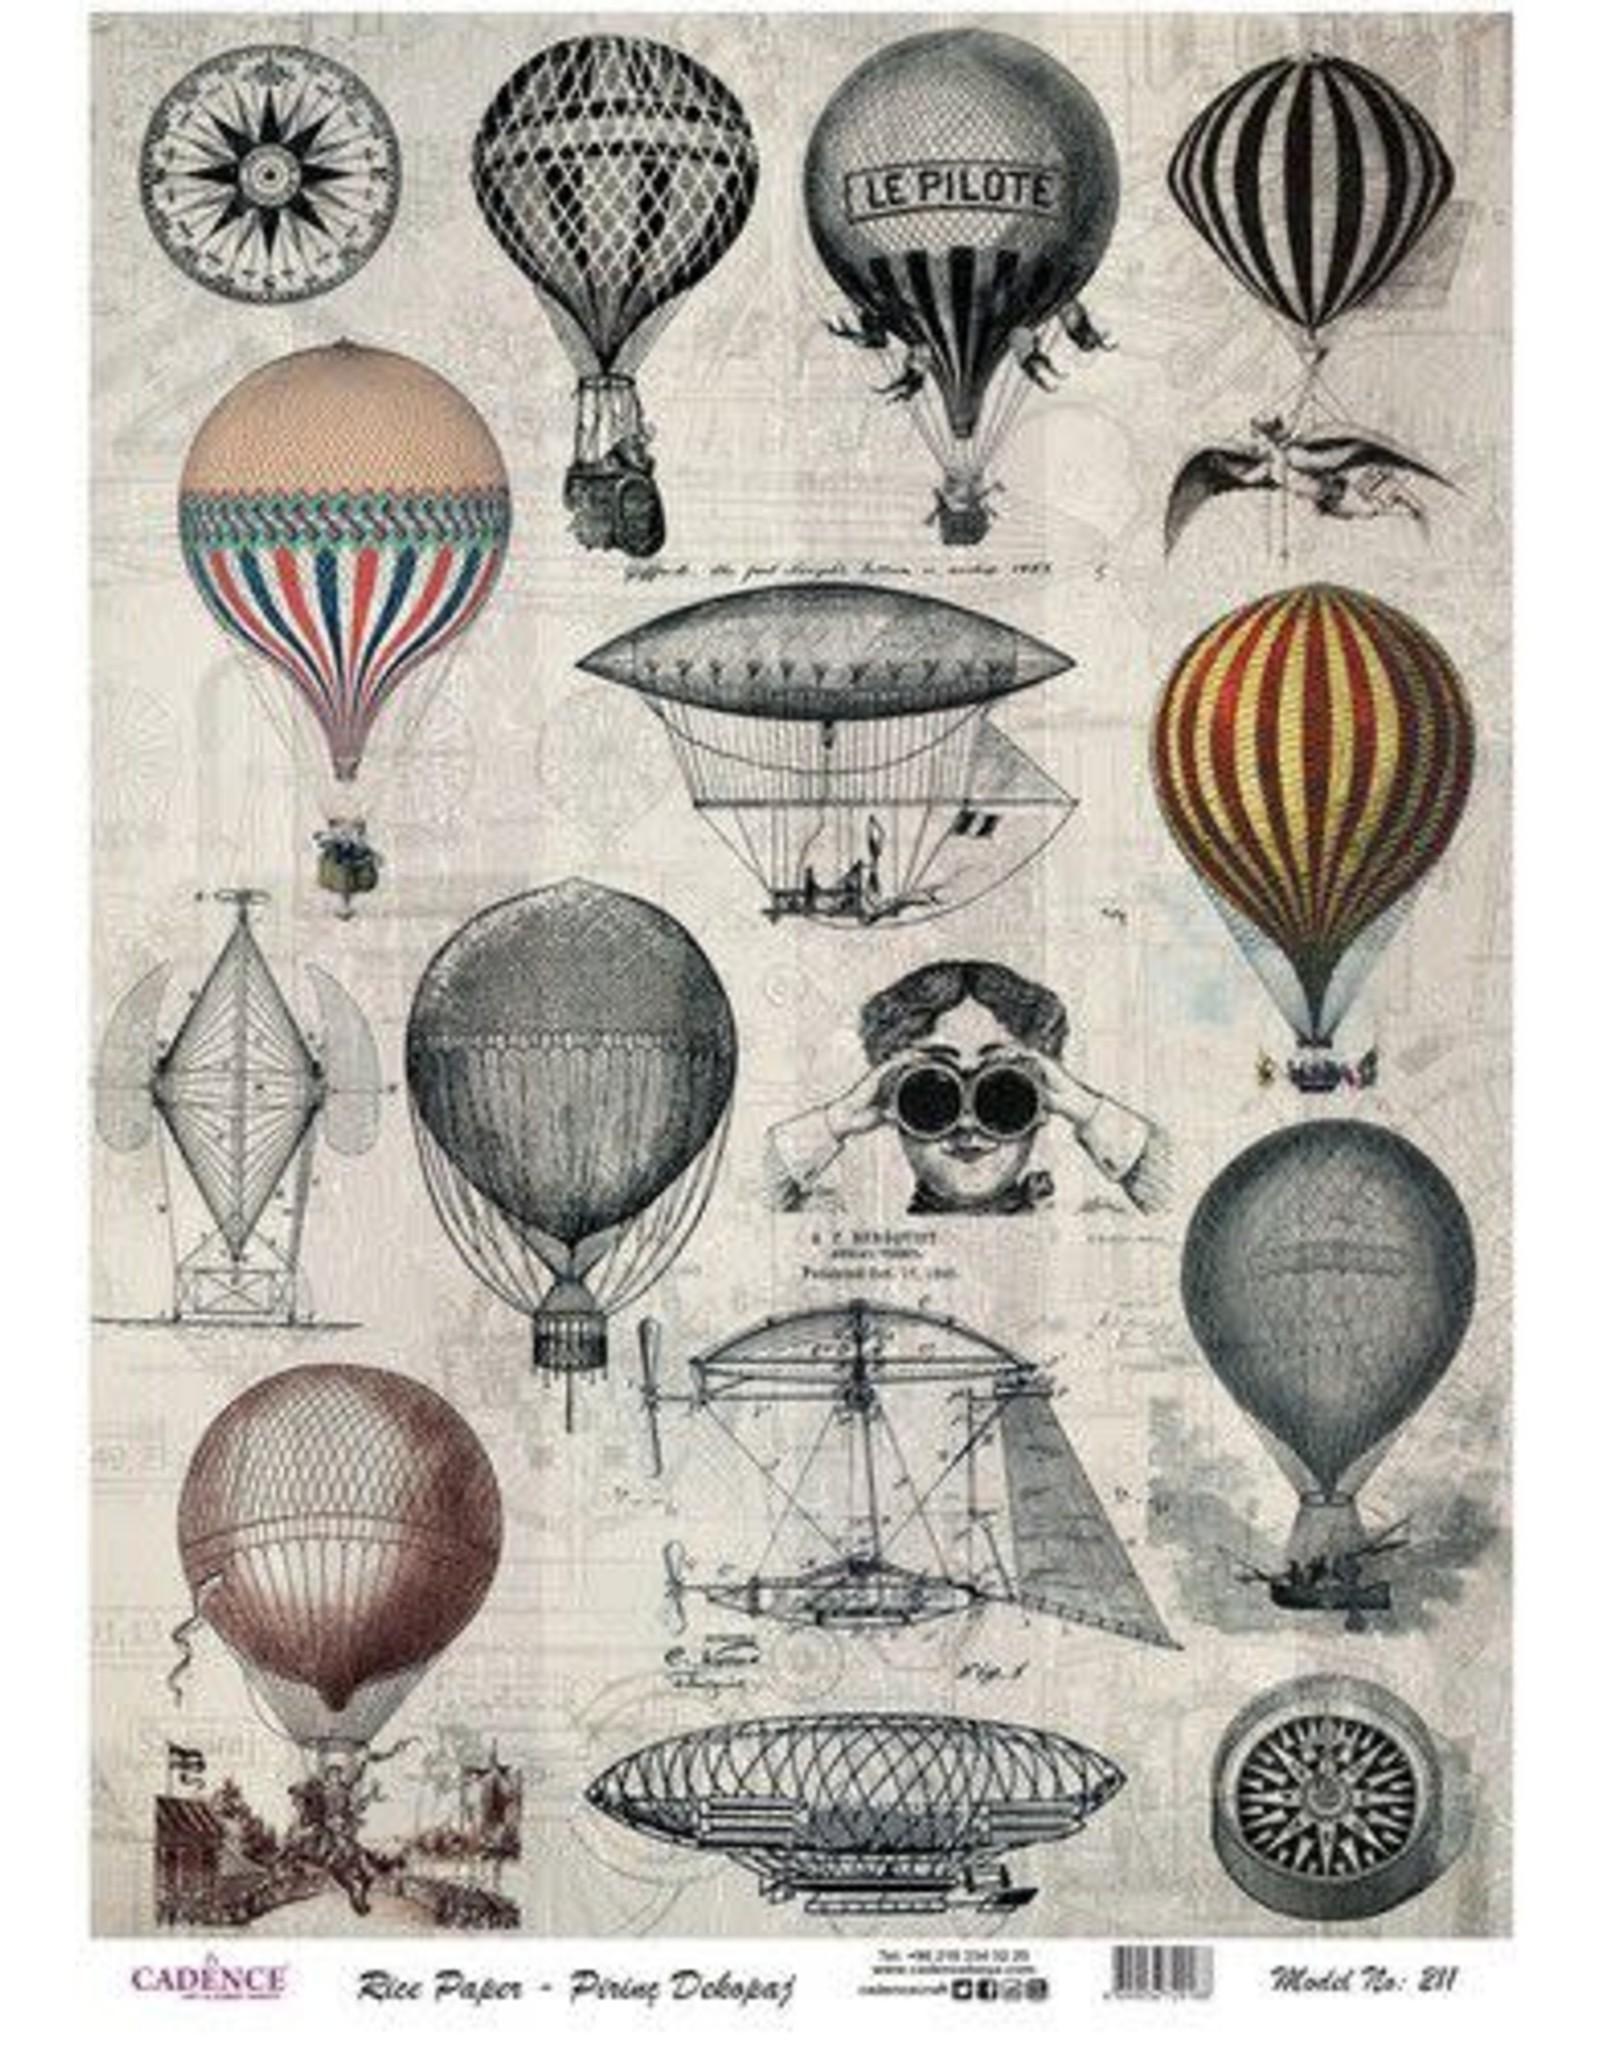 Cadence Cadence rijstpapier vintage luchtballonnen Model No: 211